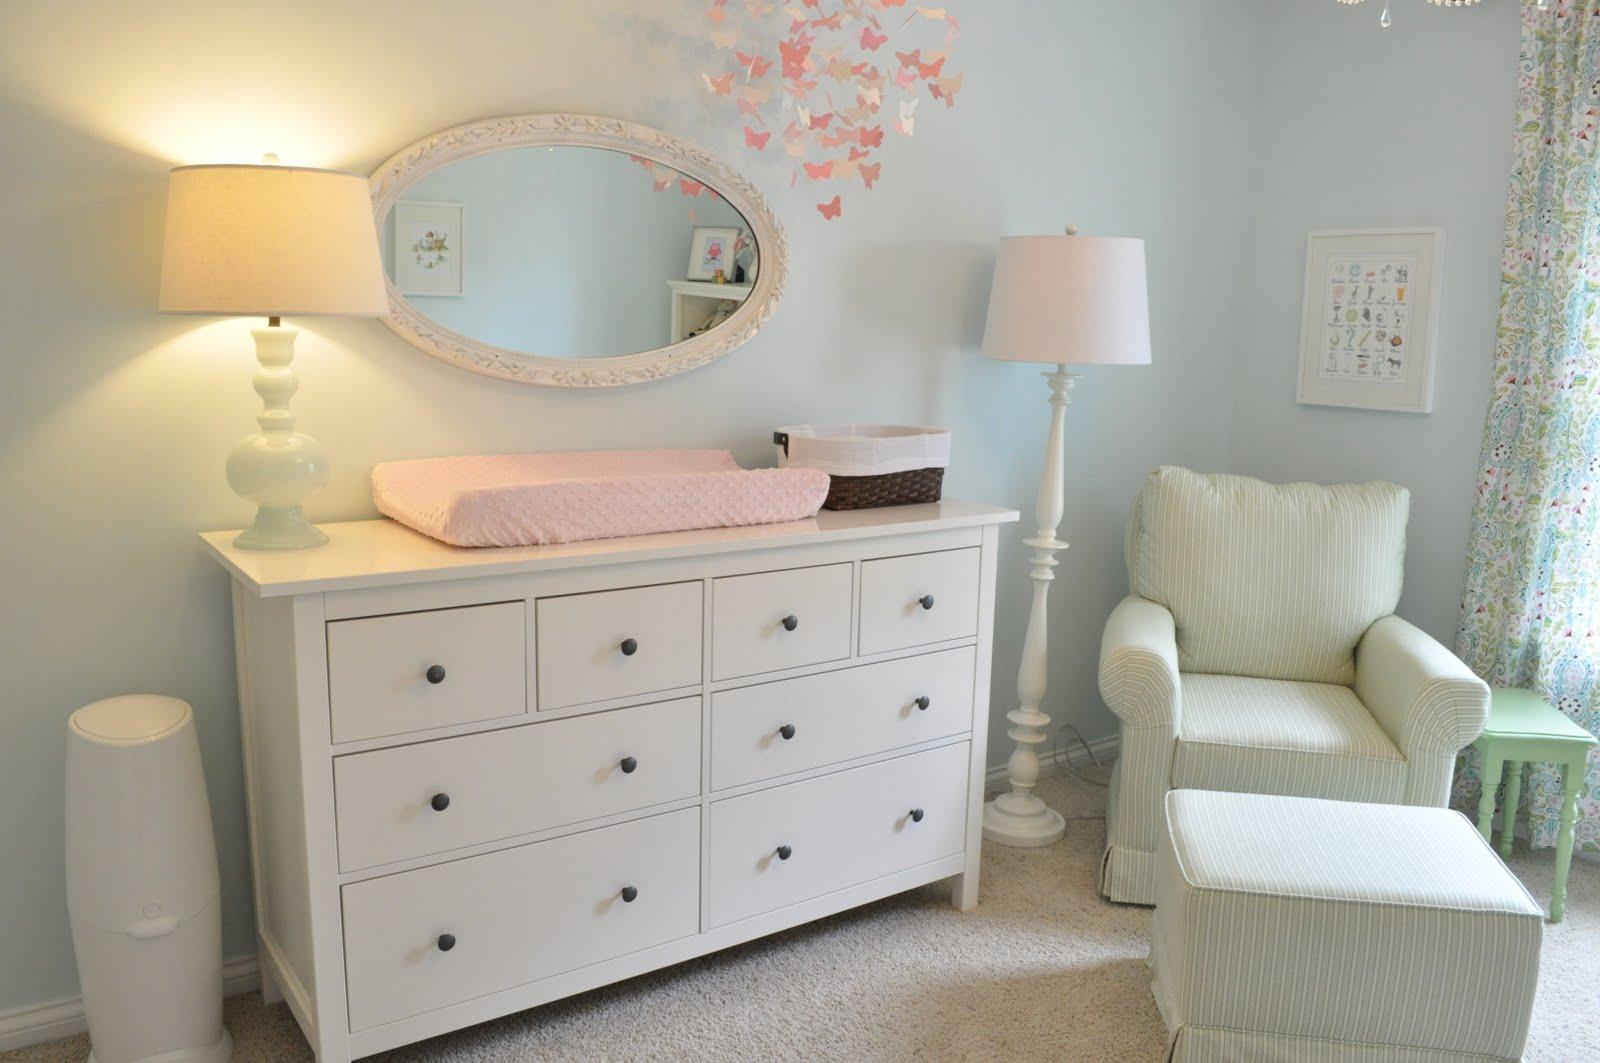 Floor lamp for nursery